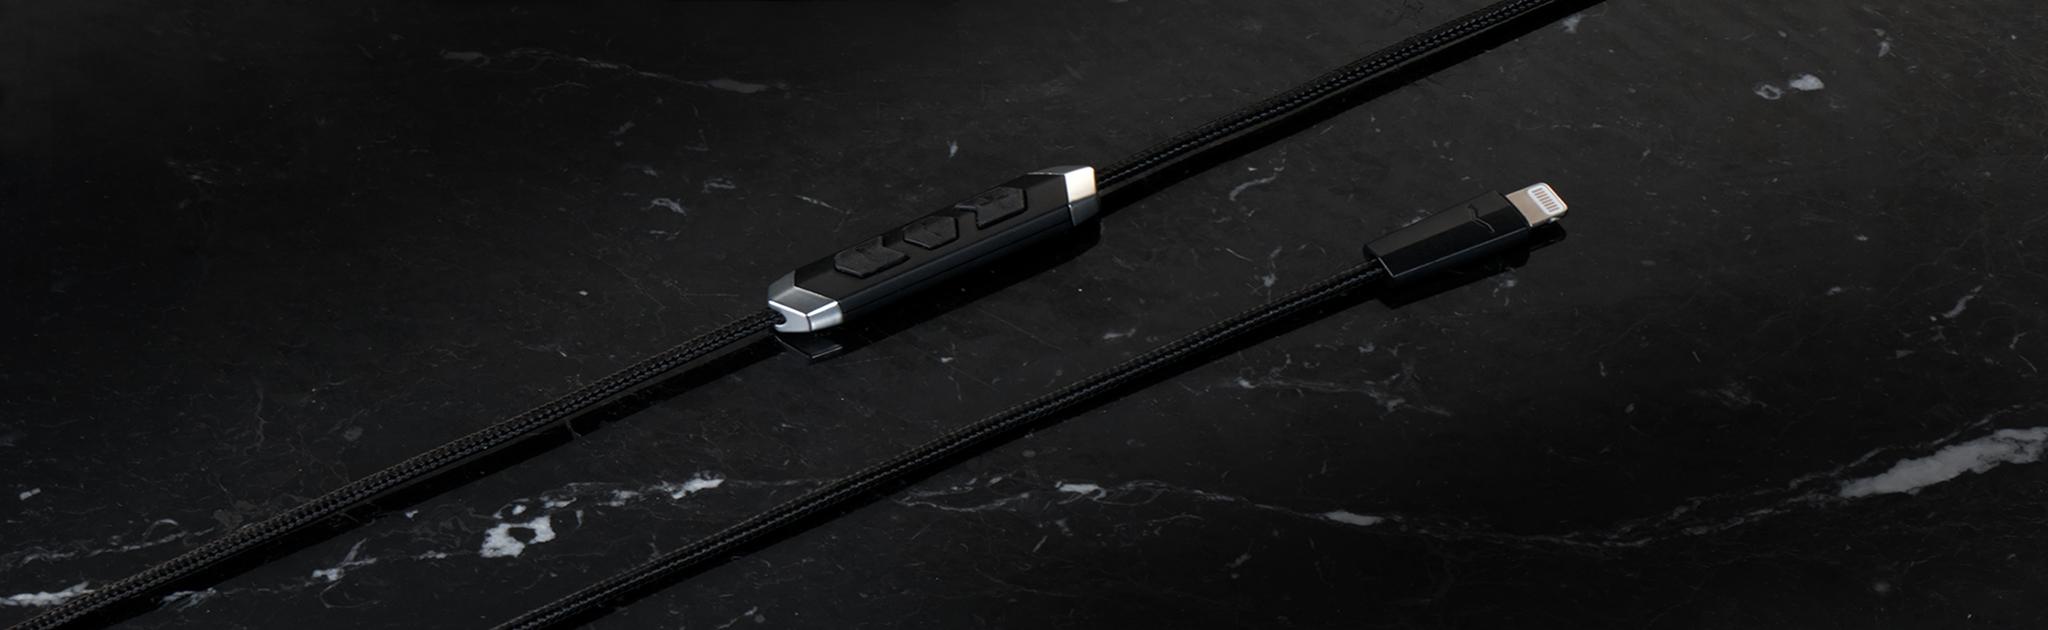 SpeakEasy DAC/AMP Lightning Cable video